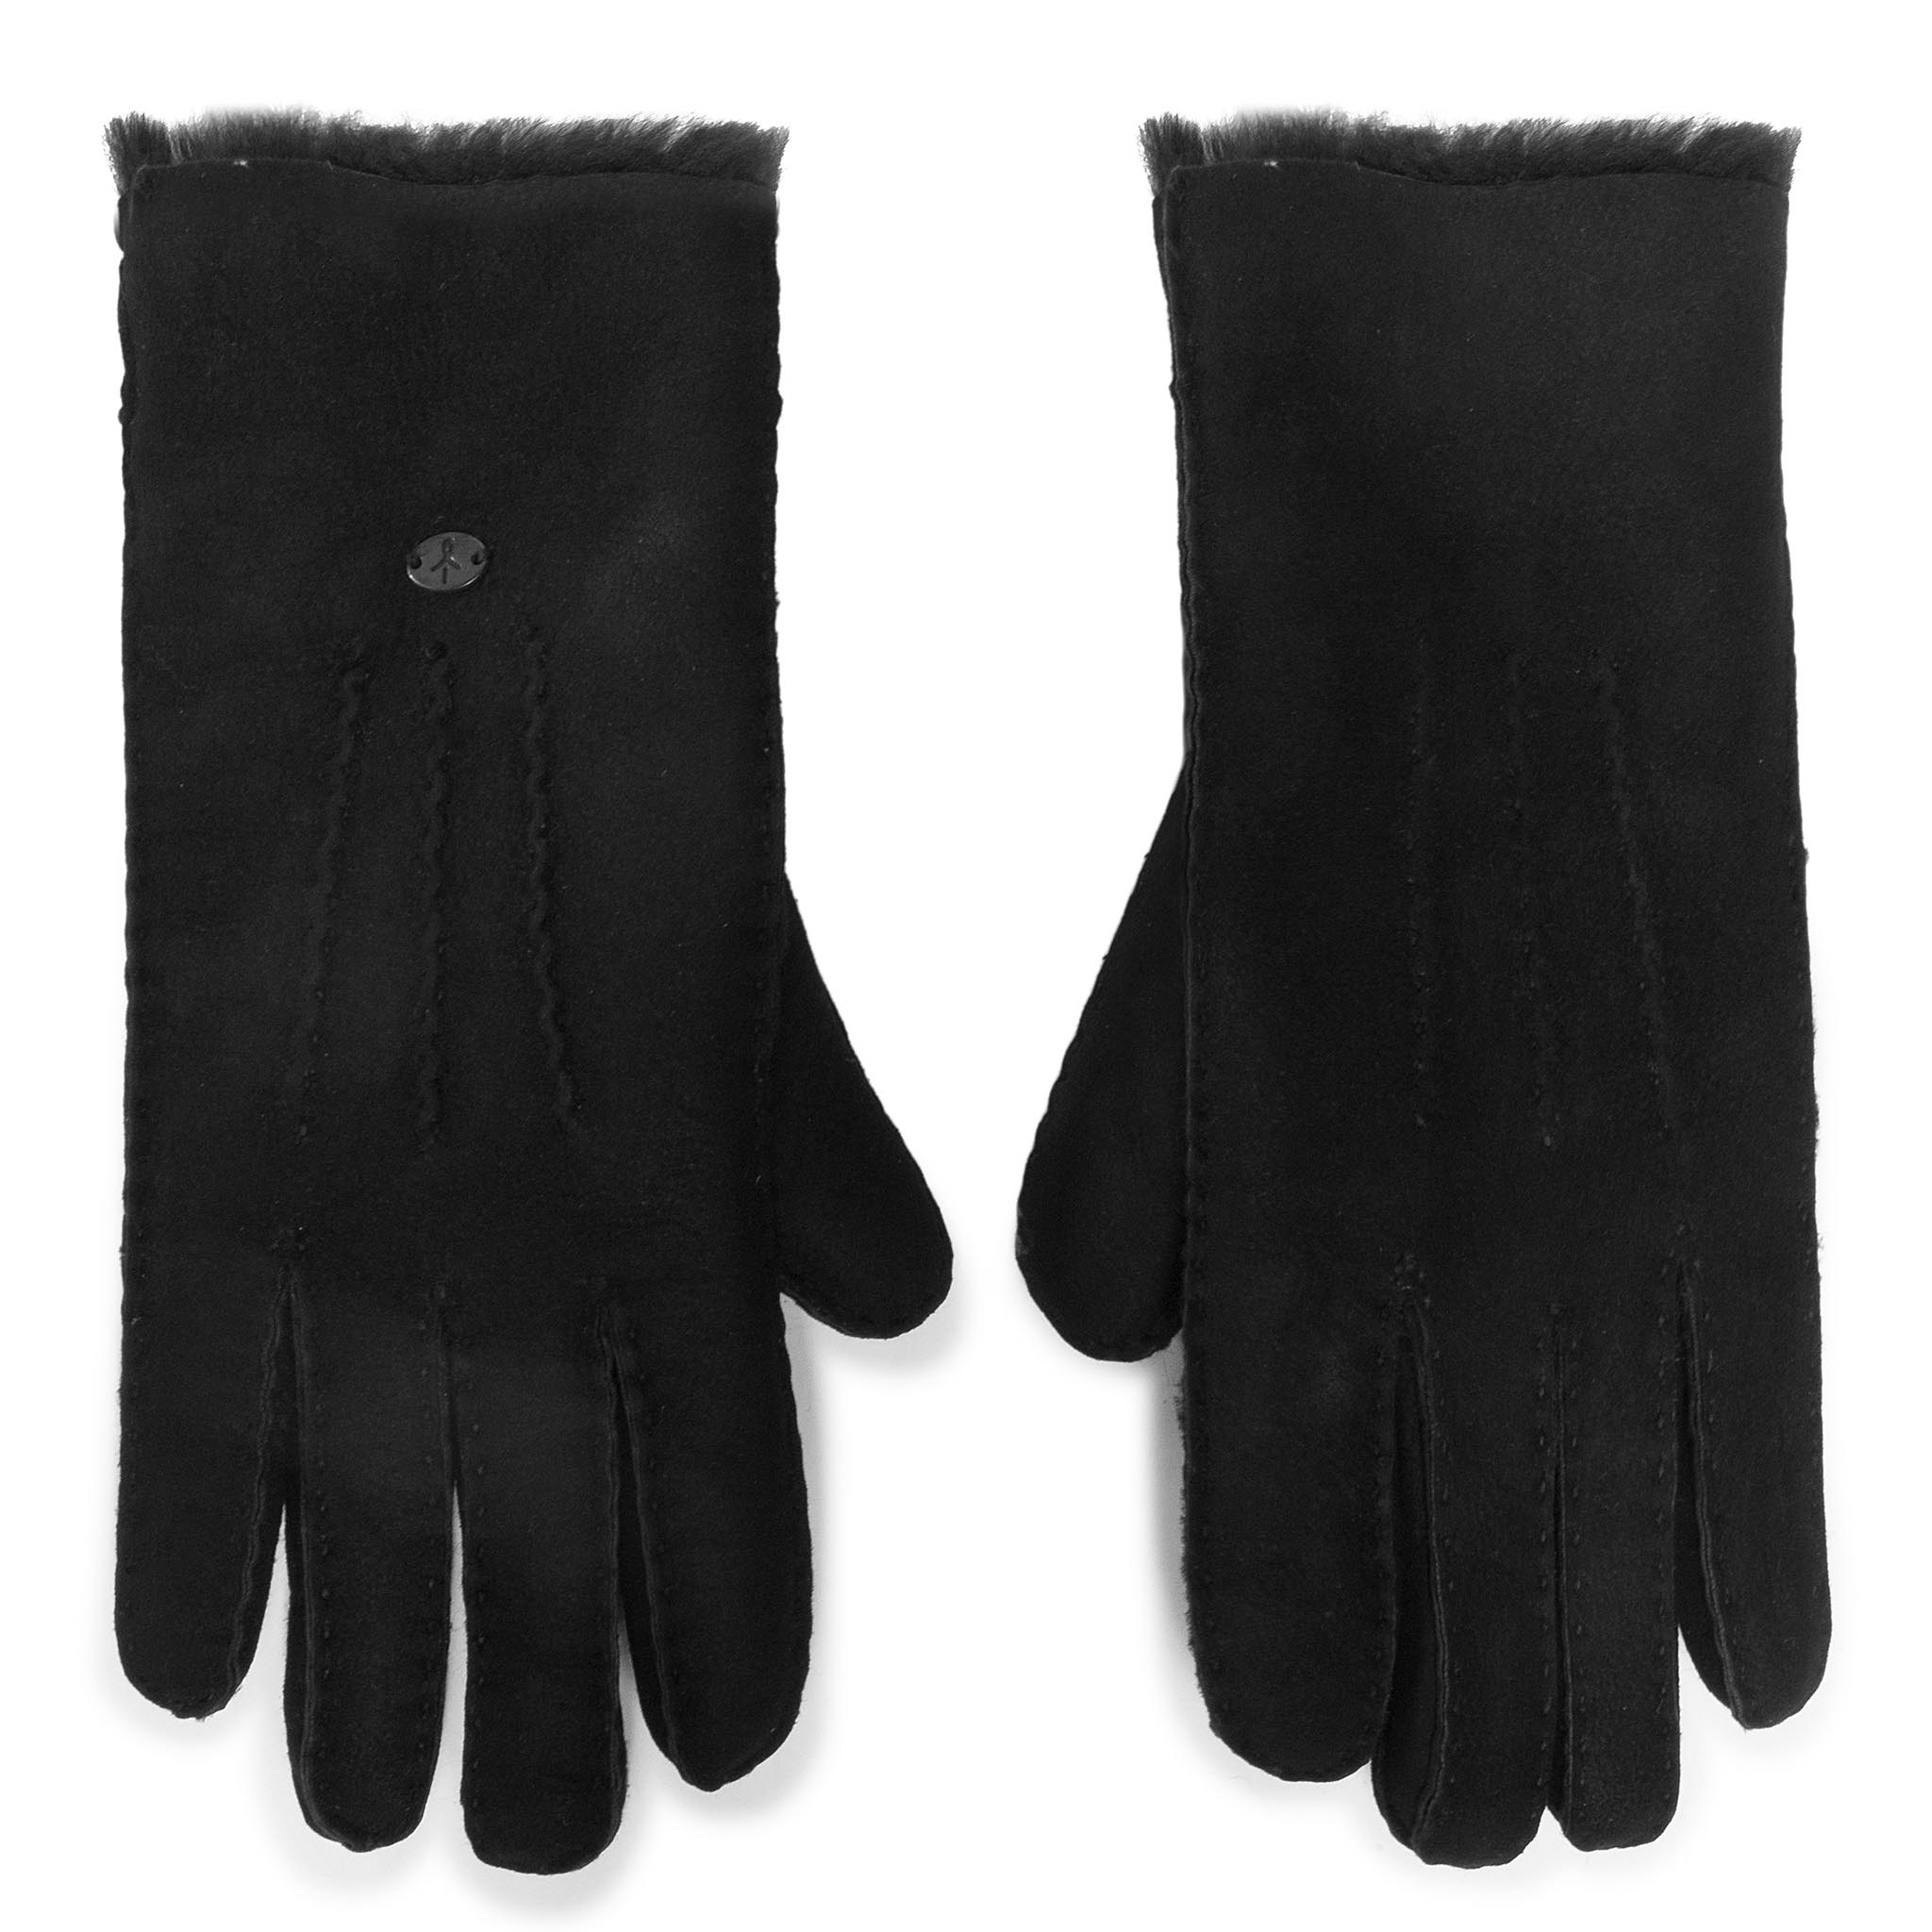 Image of Damenhandschuhe EMU AUSTRALIA - Beech Forest Gloves Black